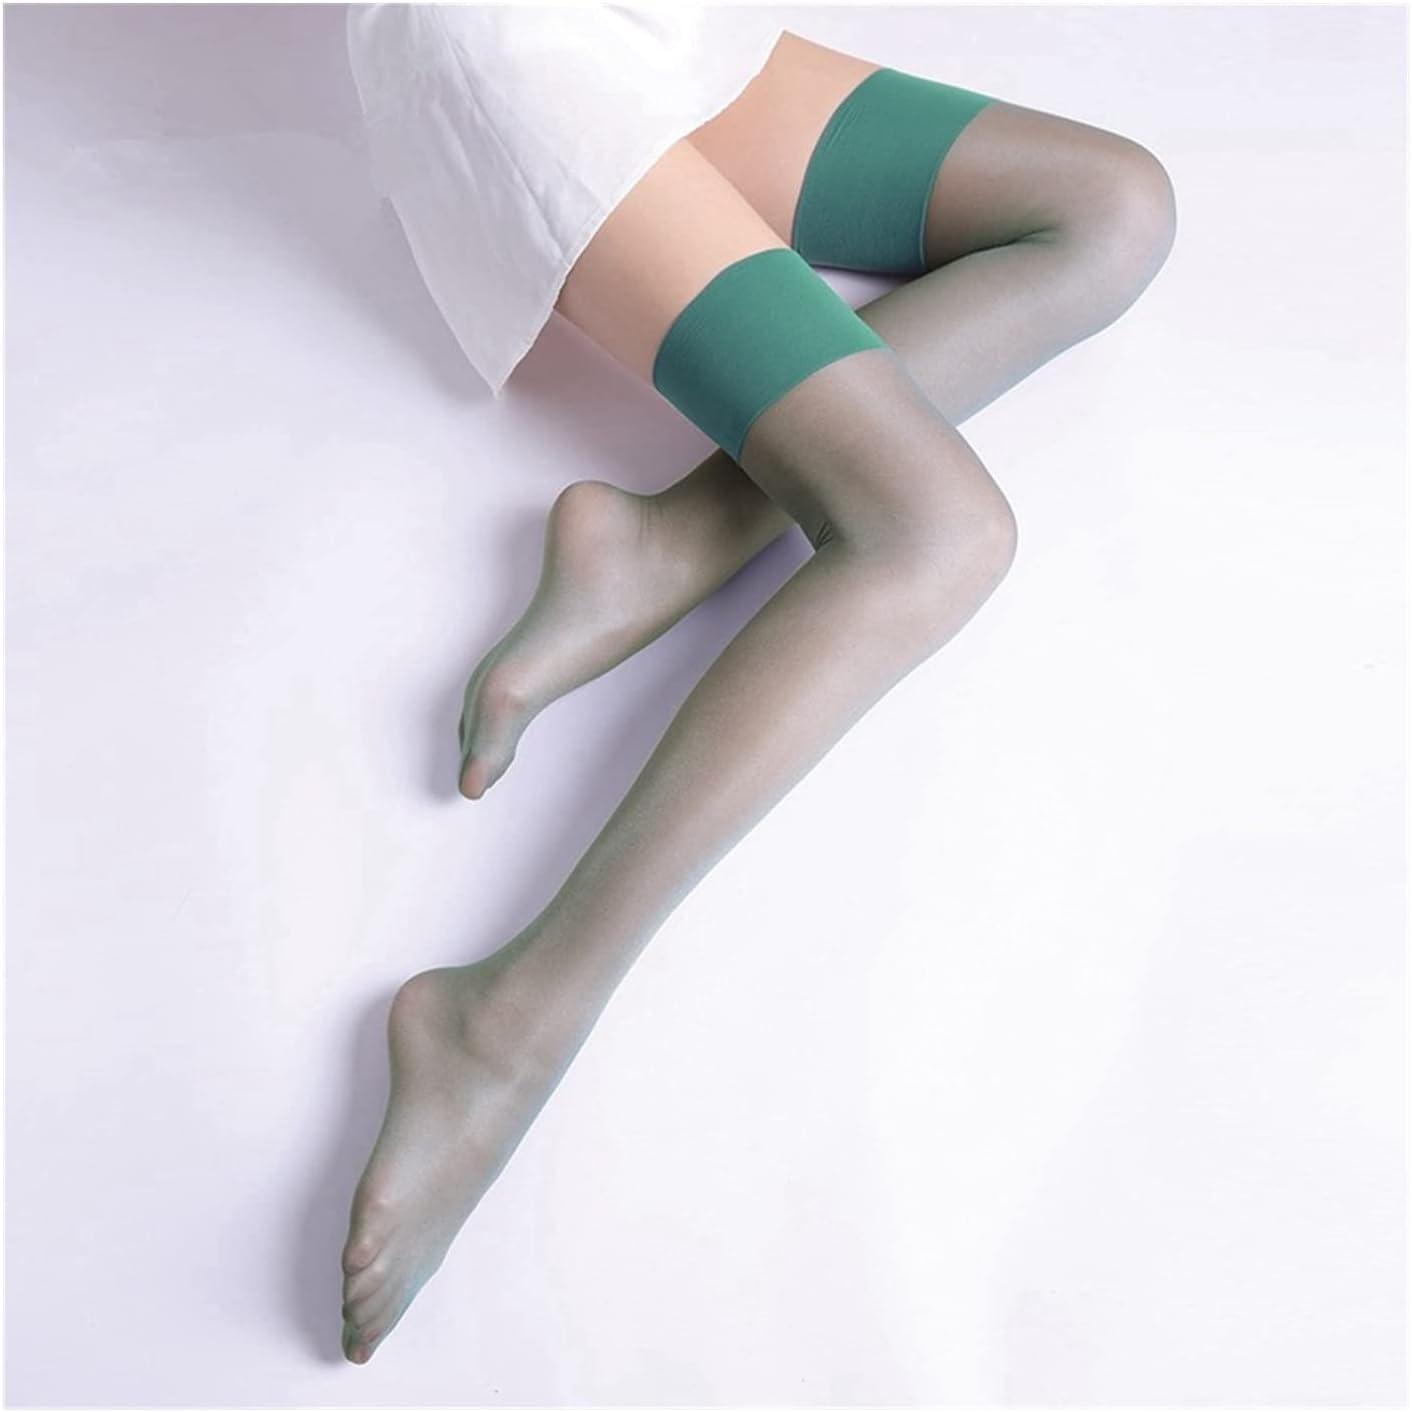 Linyuex Fashion Stockings Retro Oil Shiny Thigh High Stockings Ultra Thin Transparent Pantyhose Women Long Medias (Color : Green)